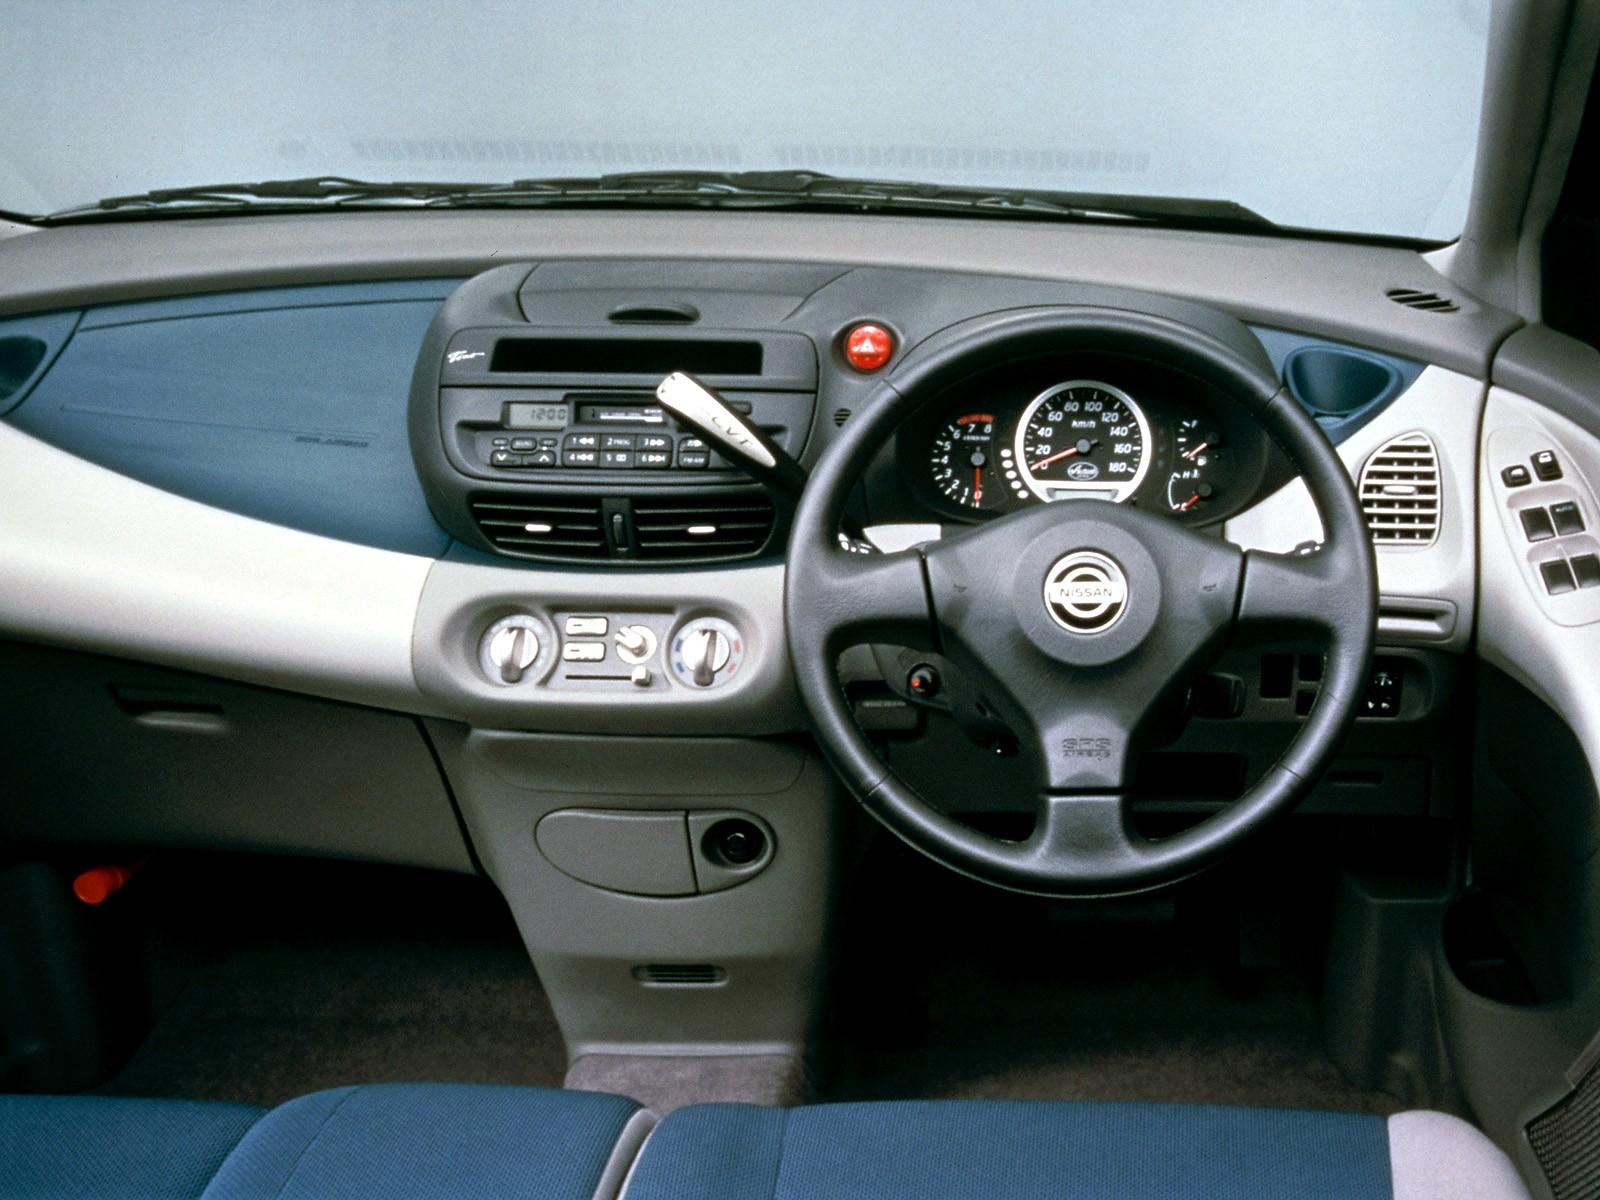 2003 Nissan Altima >> NISSAN Almera Tino specs & photos - 2000, 2001, 2002, 2003, 2004, 2005, 2006 - autoevolution